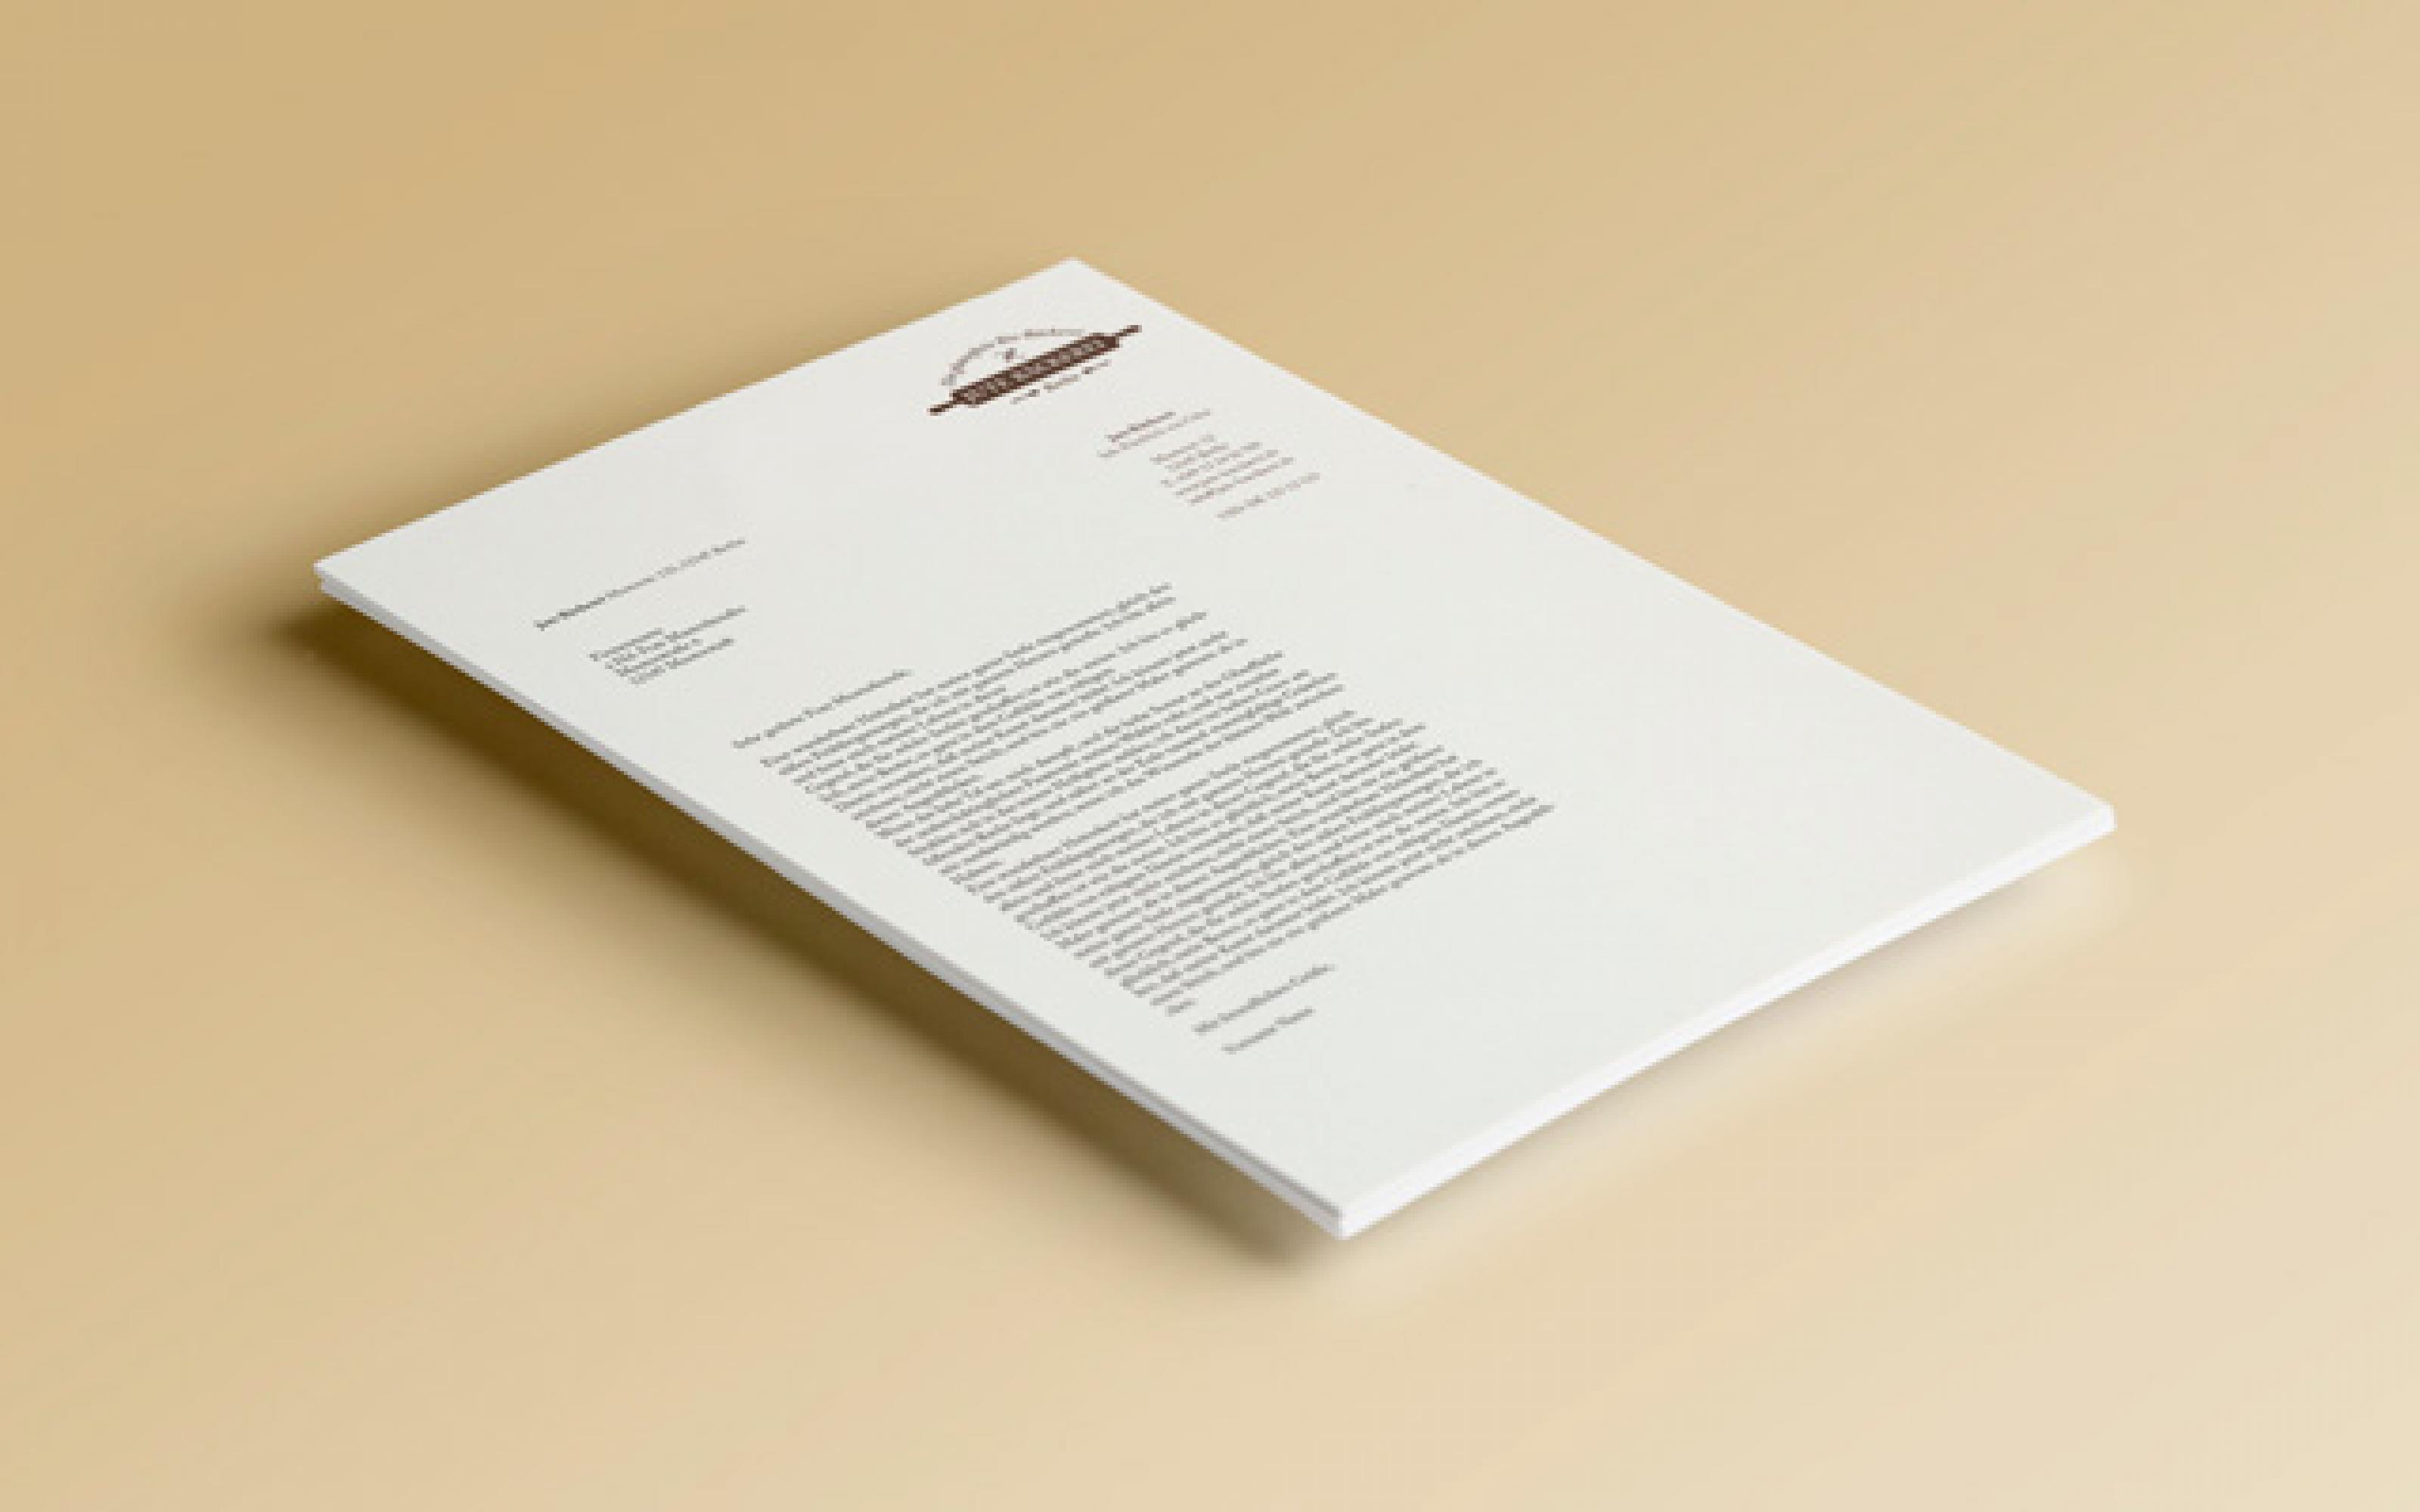 JuteBäckerei-glutenfreieBäckerei-Briefpapier-FORMLOS-Berlin-StationaryDesign-04